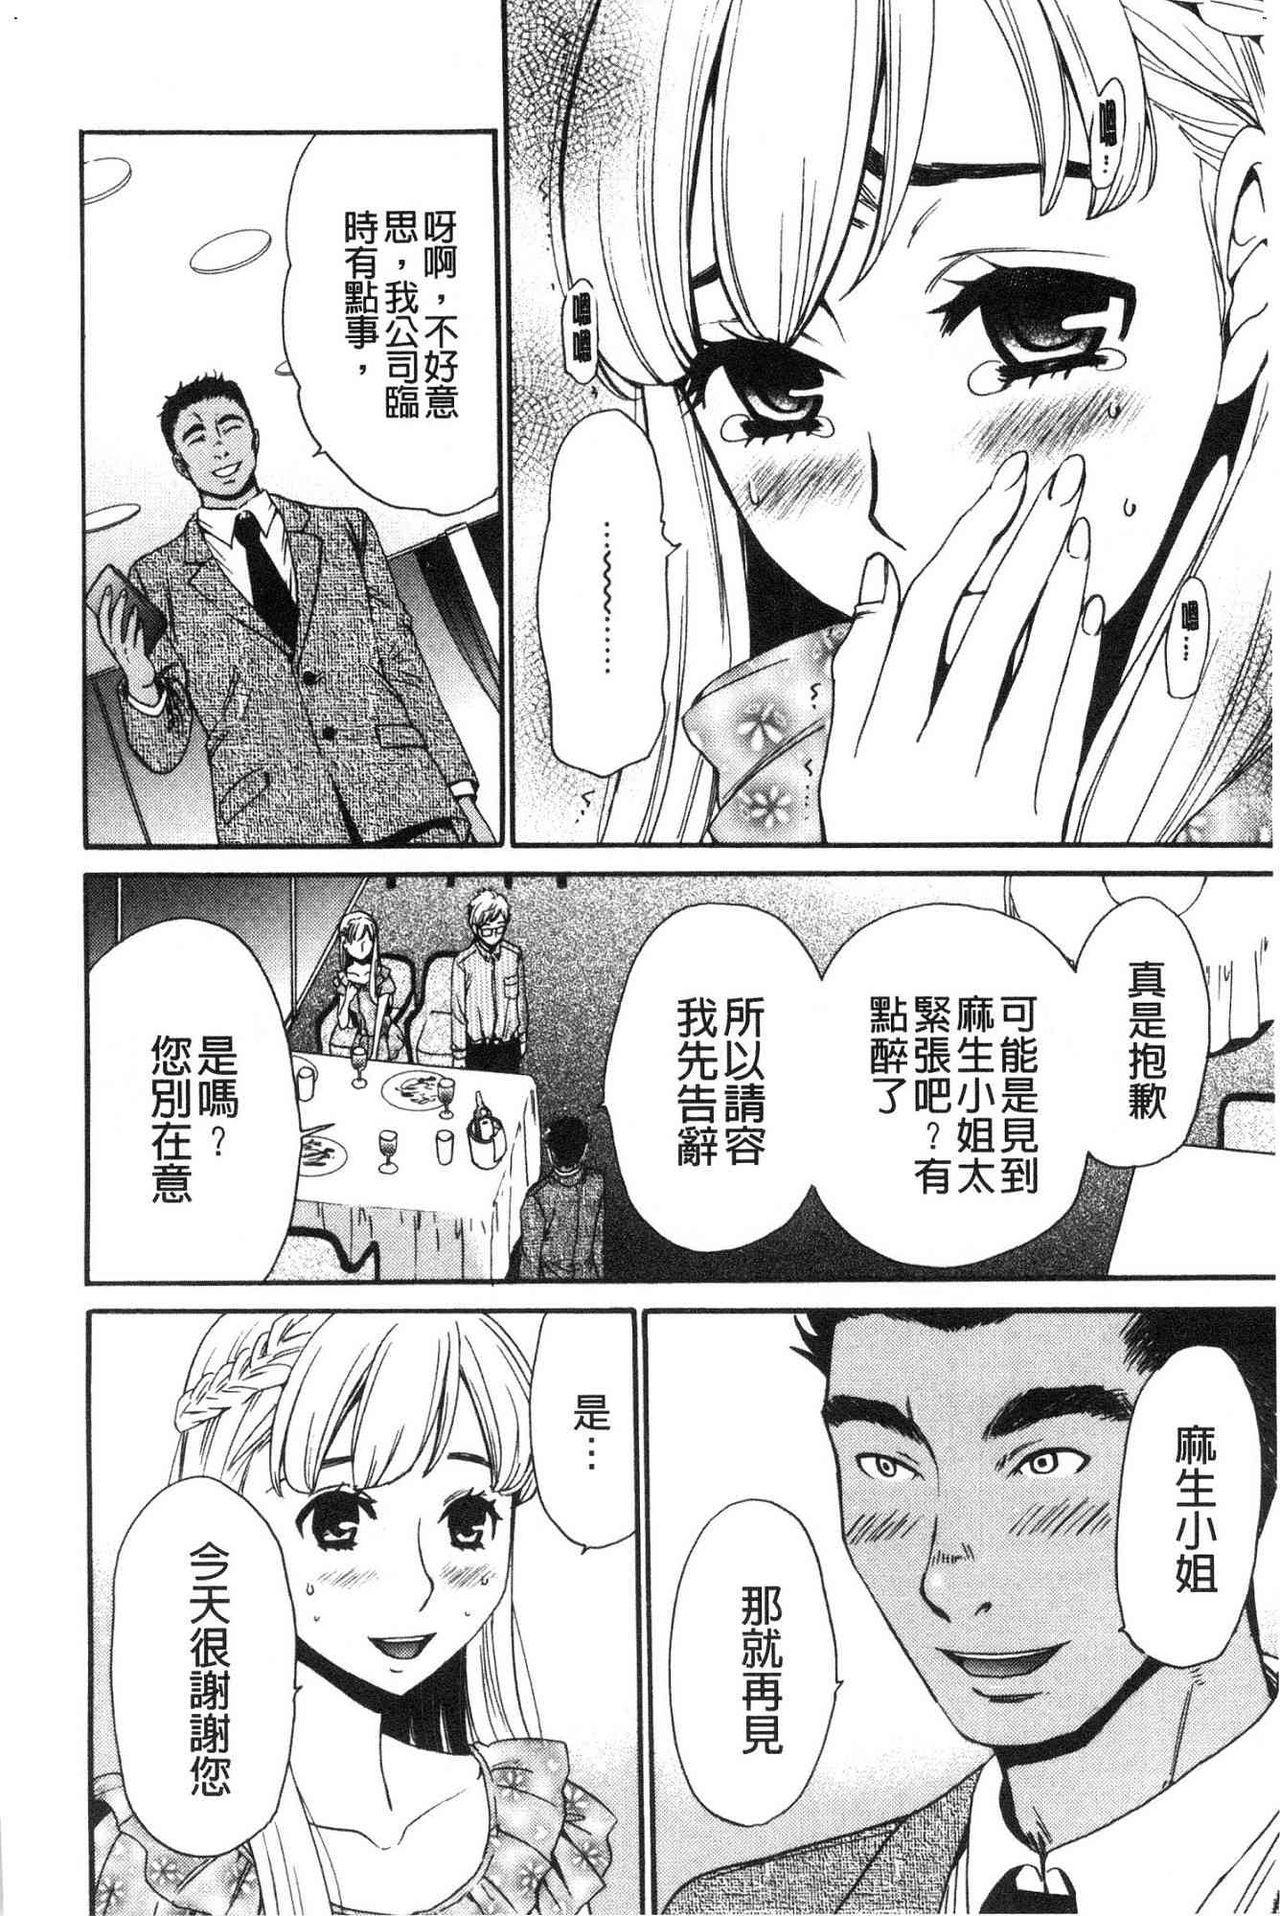 [Gotoh Akira]  21-ji no Onna ~Camera no Mae no Mesuinu~ 2 | 21時之女 ~鏡頭前的牝犬~ 2 [Chinese] 11